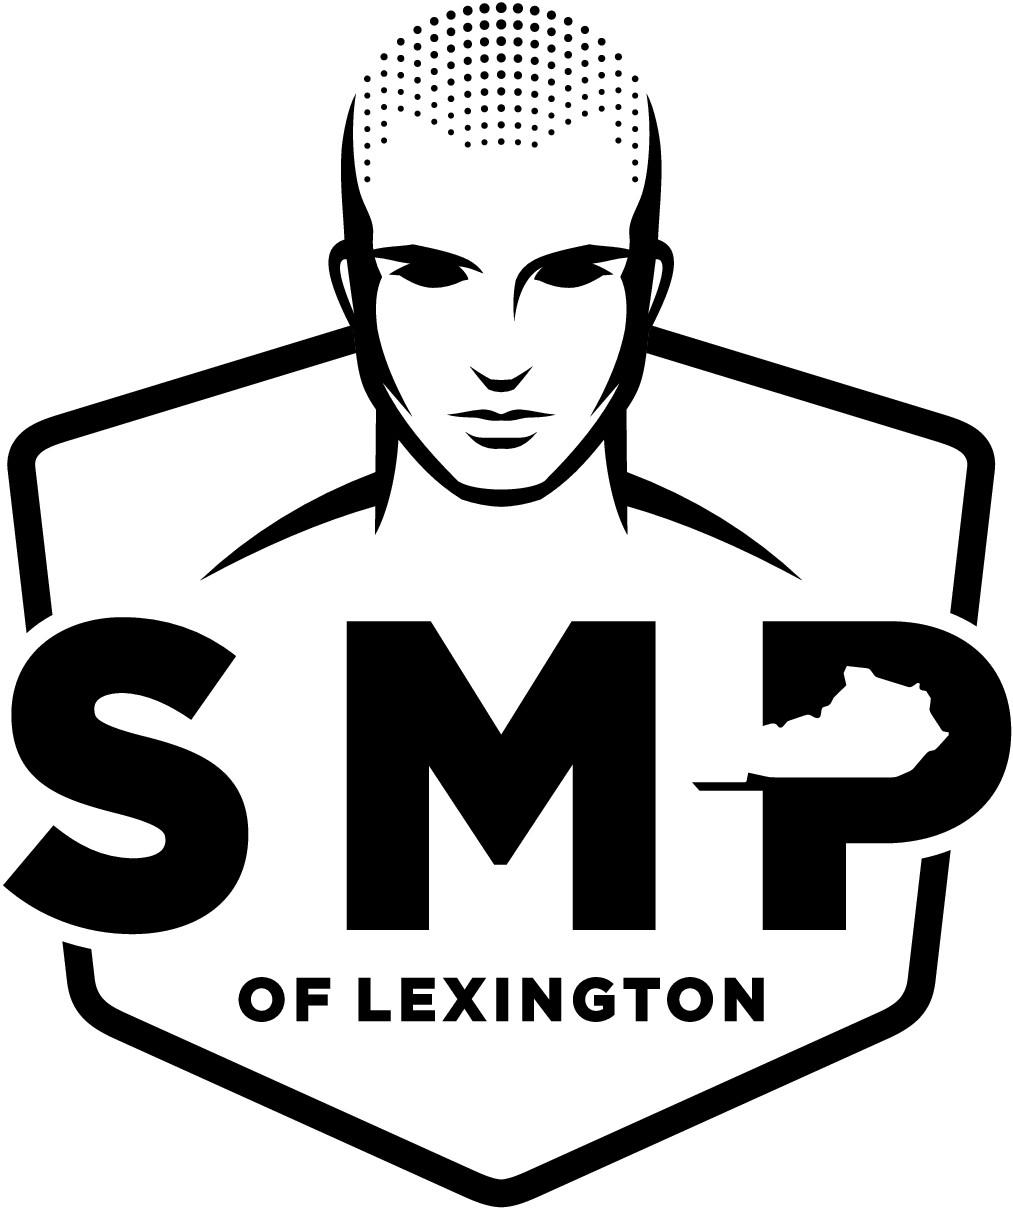 Bald Head + Dots (Logo)